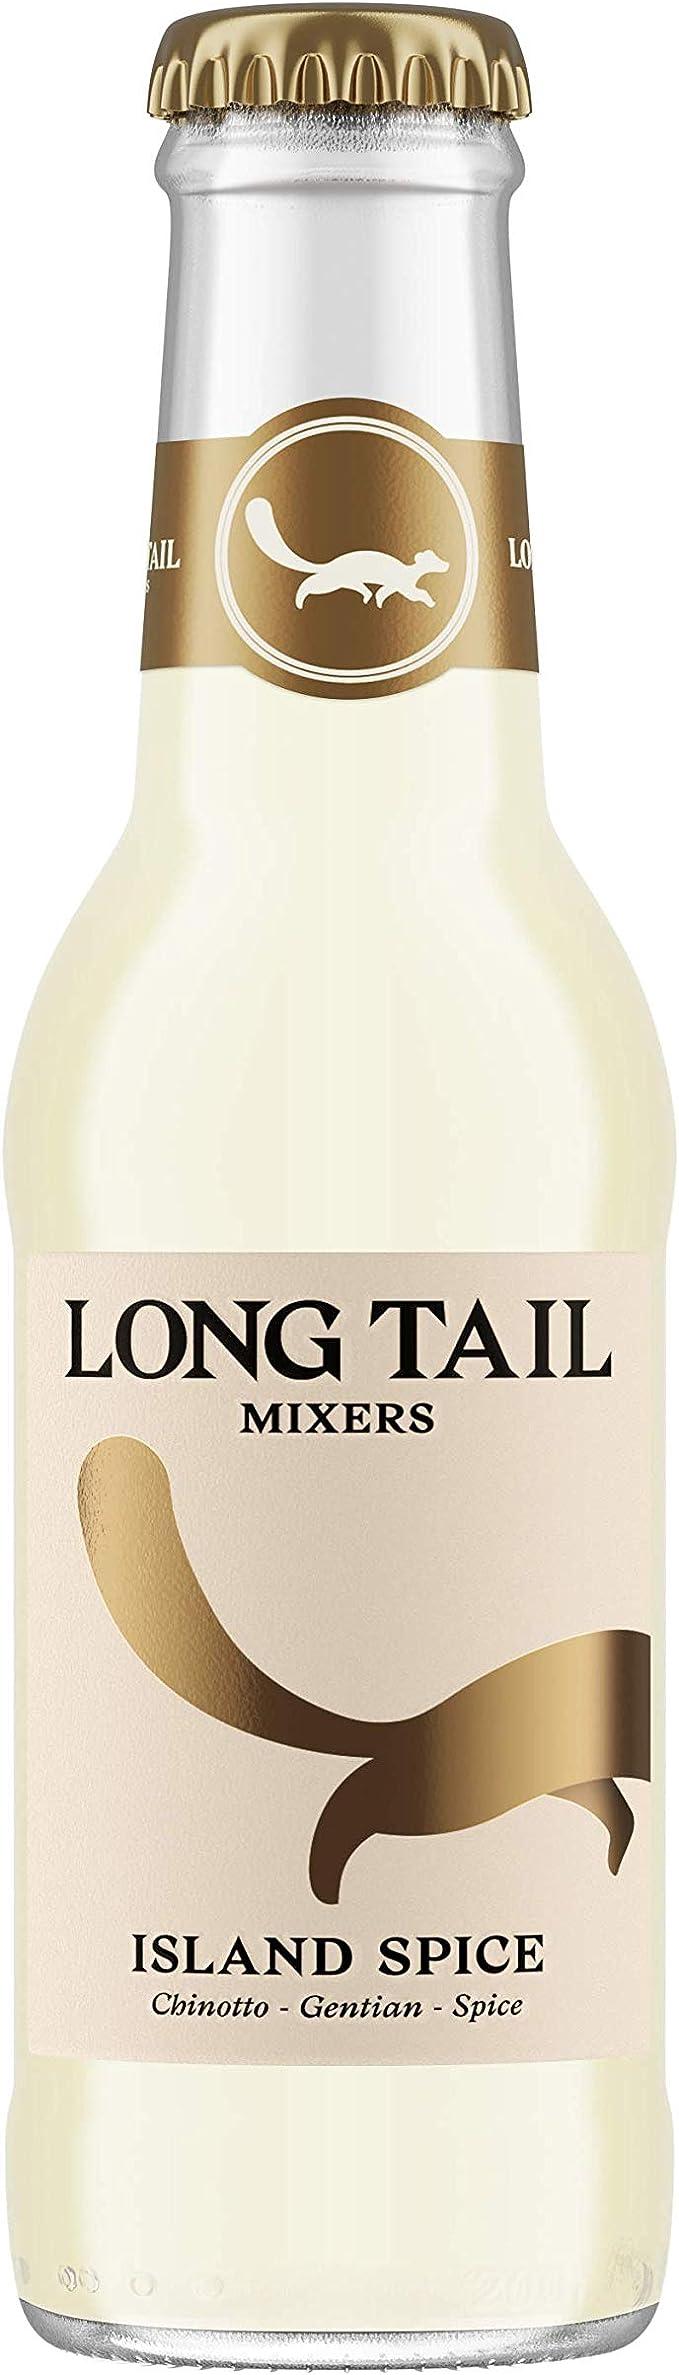 Mezclador de especias Island 200 ml, paquete de 24 mezcladores para ron, tequila o vodka, ingredientes 100% naturales